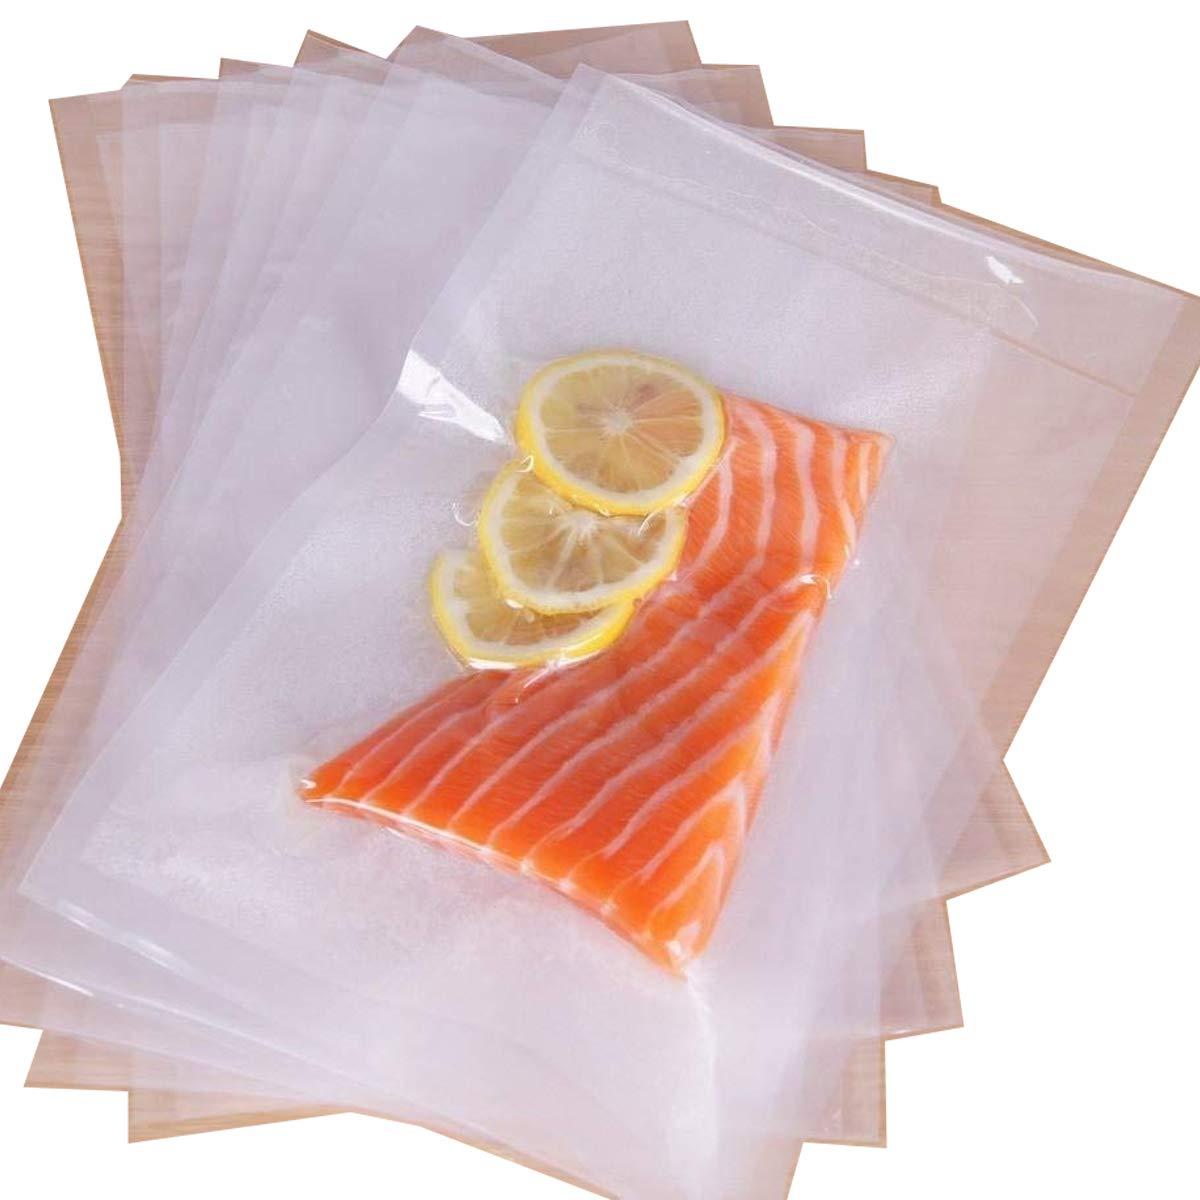 Fineway® set di 100Sous Vide sottovuoto food Bags–riutilizzabili Veg Saver Storage ogni borsa è 20cm x 30cm HSI